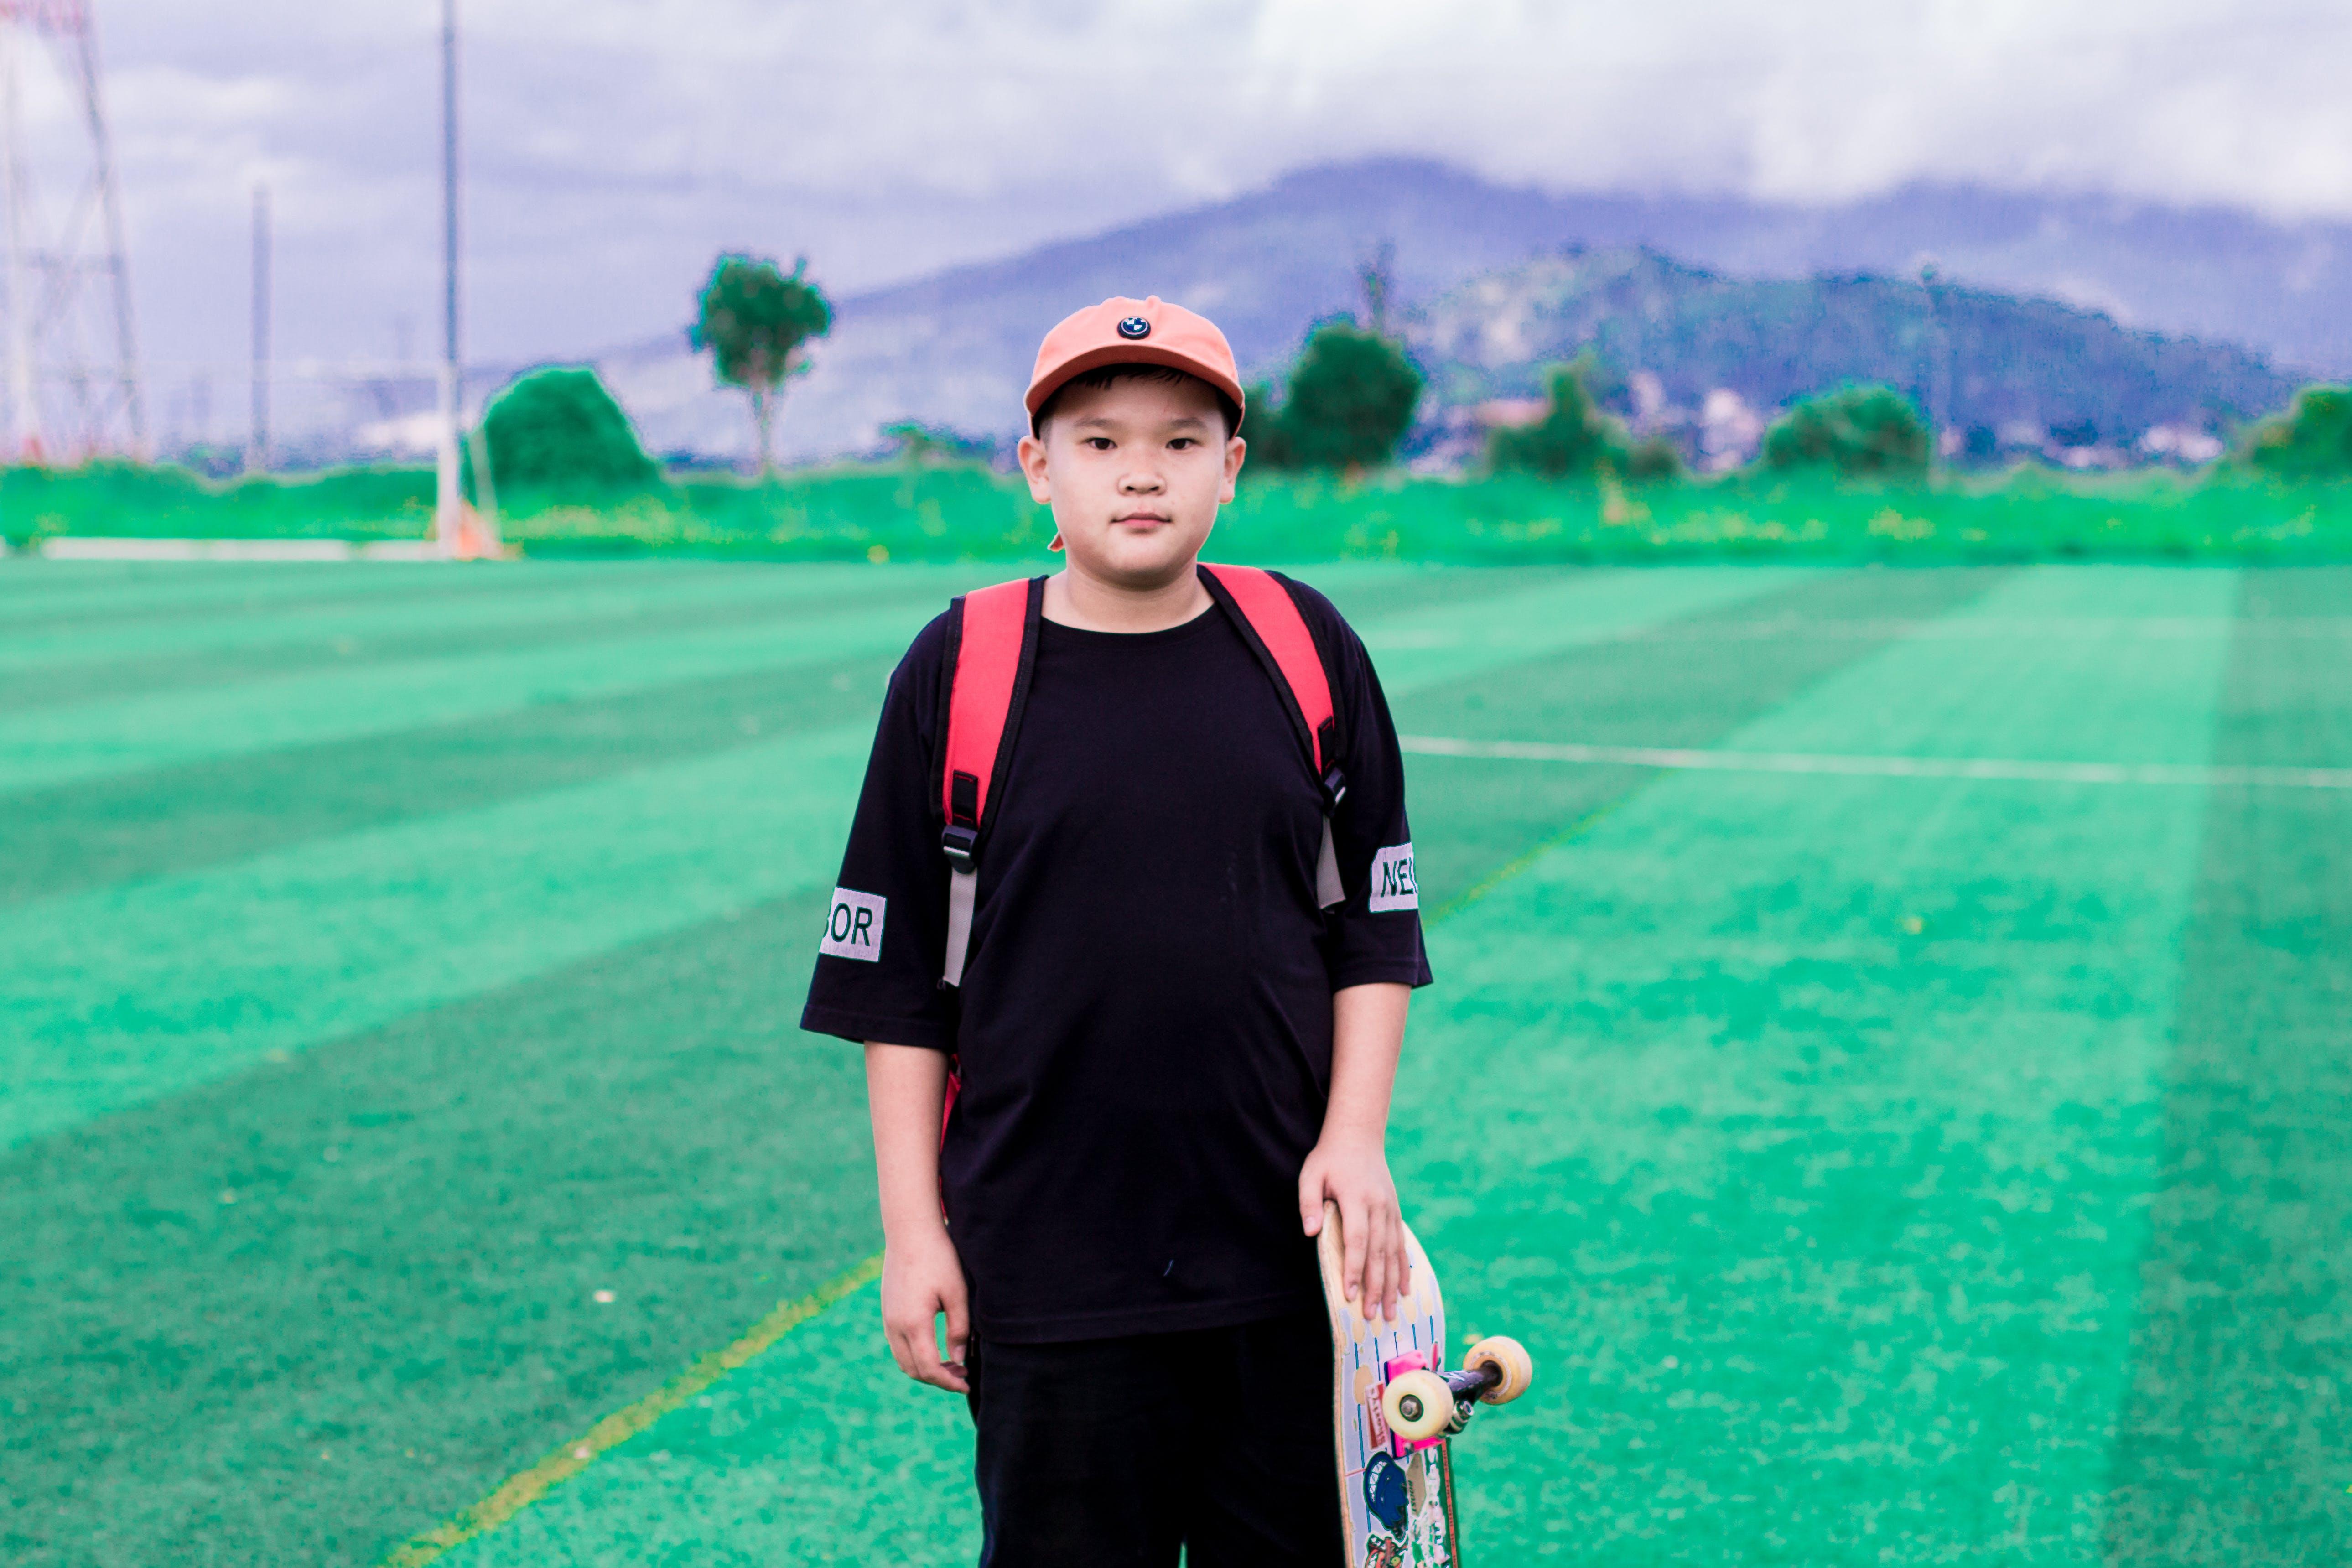 Photo of Boy Holding Skateboard